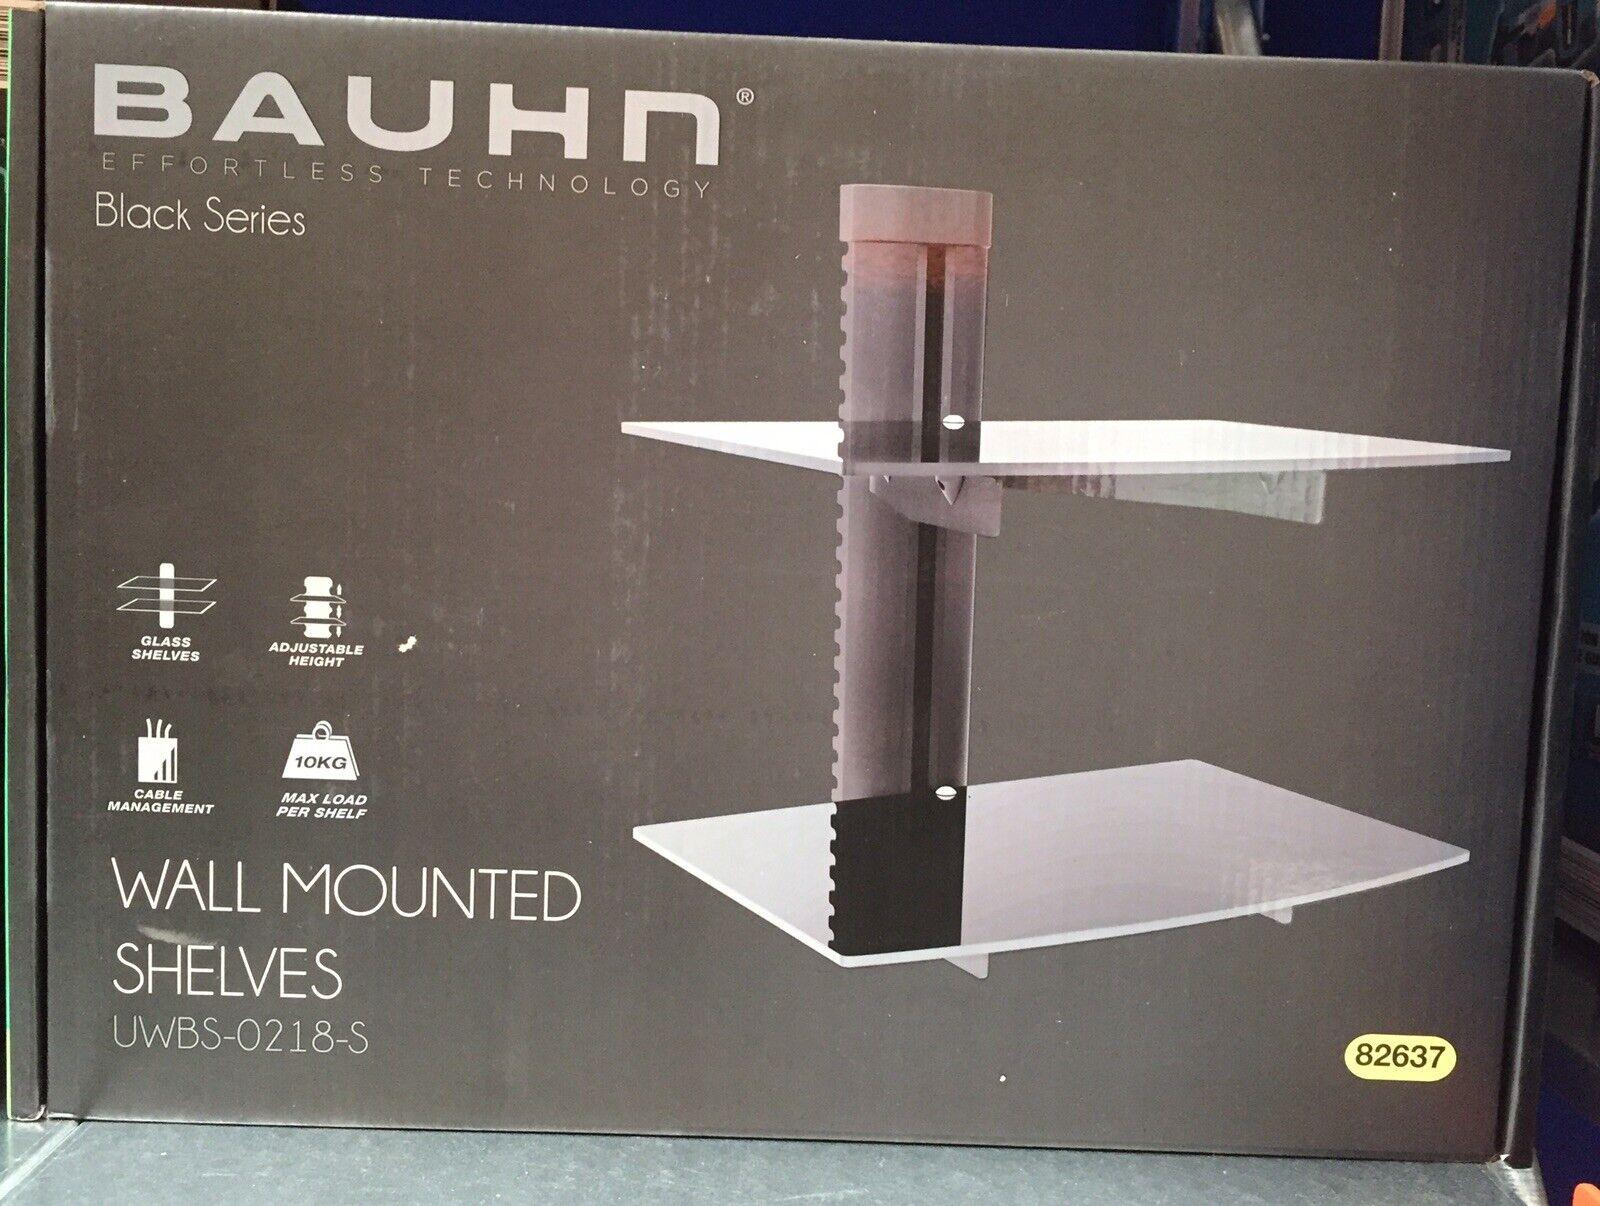 hight resolution of bauhn wall mounted console dvd shelves black series effortless home theatre shelf bauhn diagram